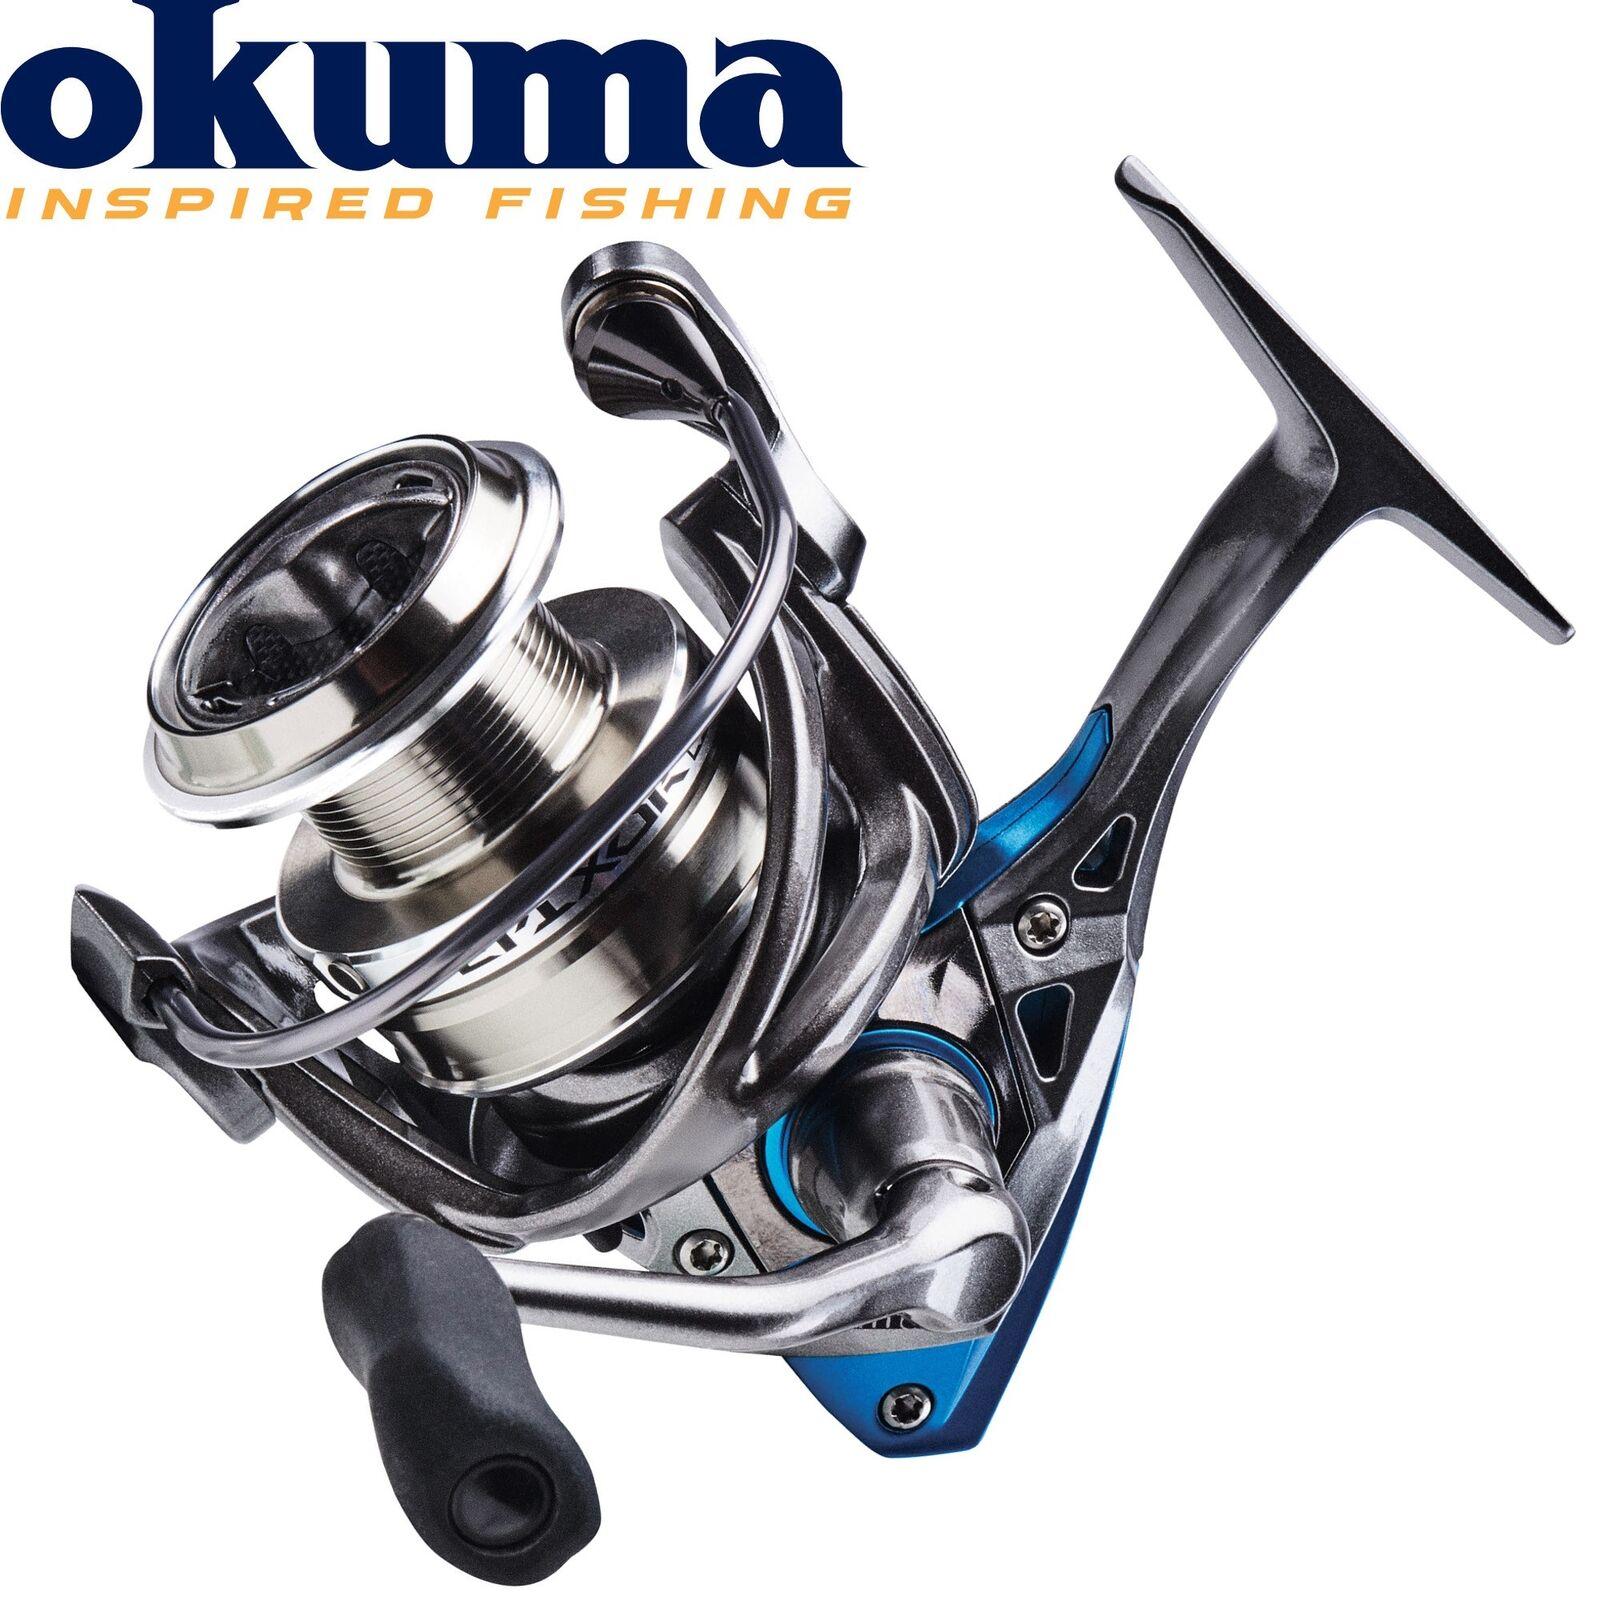 Okuma Epixor LS Spinning EPL-50 - Spinnrolle zum Hechtangeln, Hechtrolle, Rolle